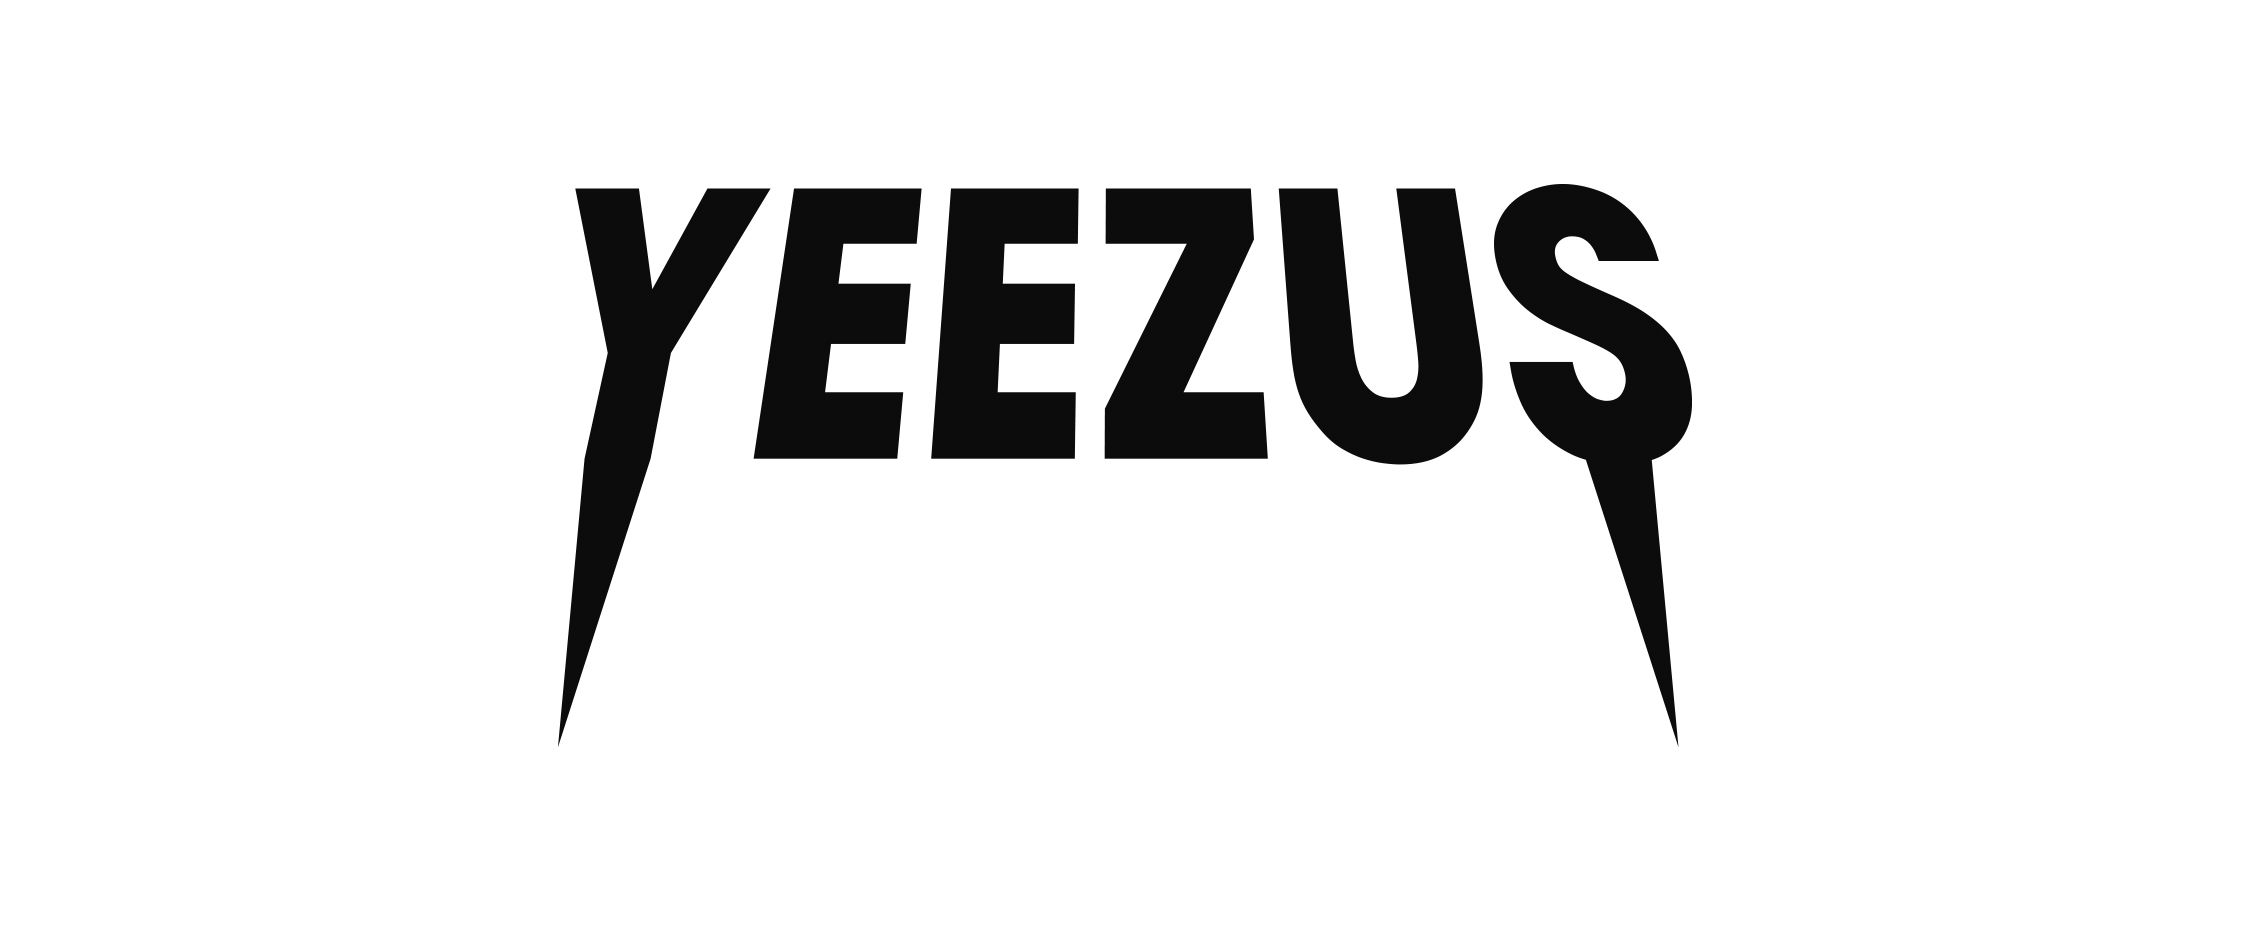 John Galt Kanye West For President 2020 Vinyl Sticker Car Styling Waterproof Decal Auto Bumper Sticker Wish